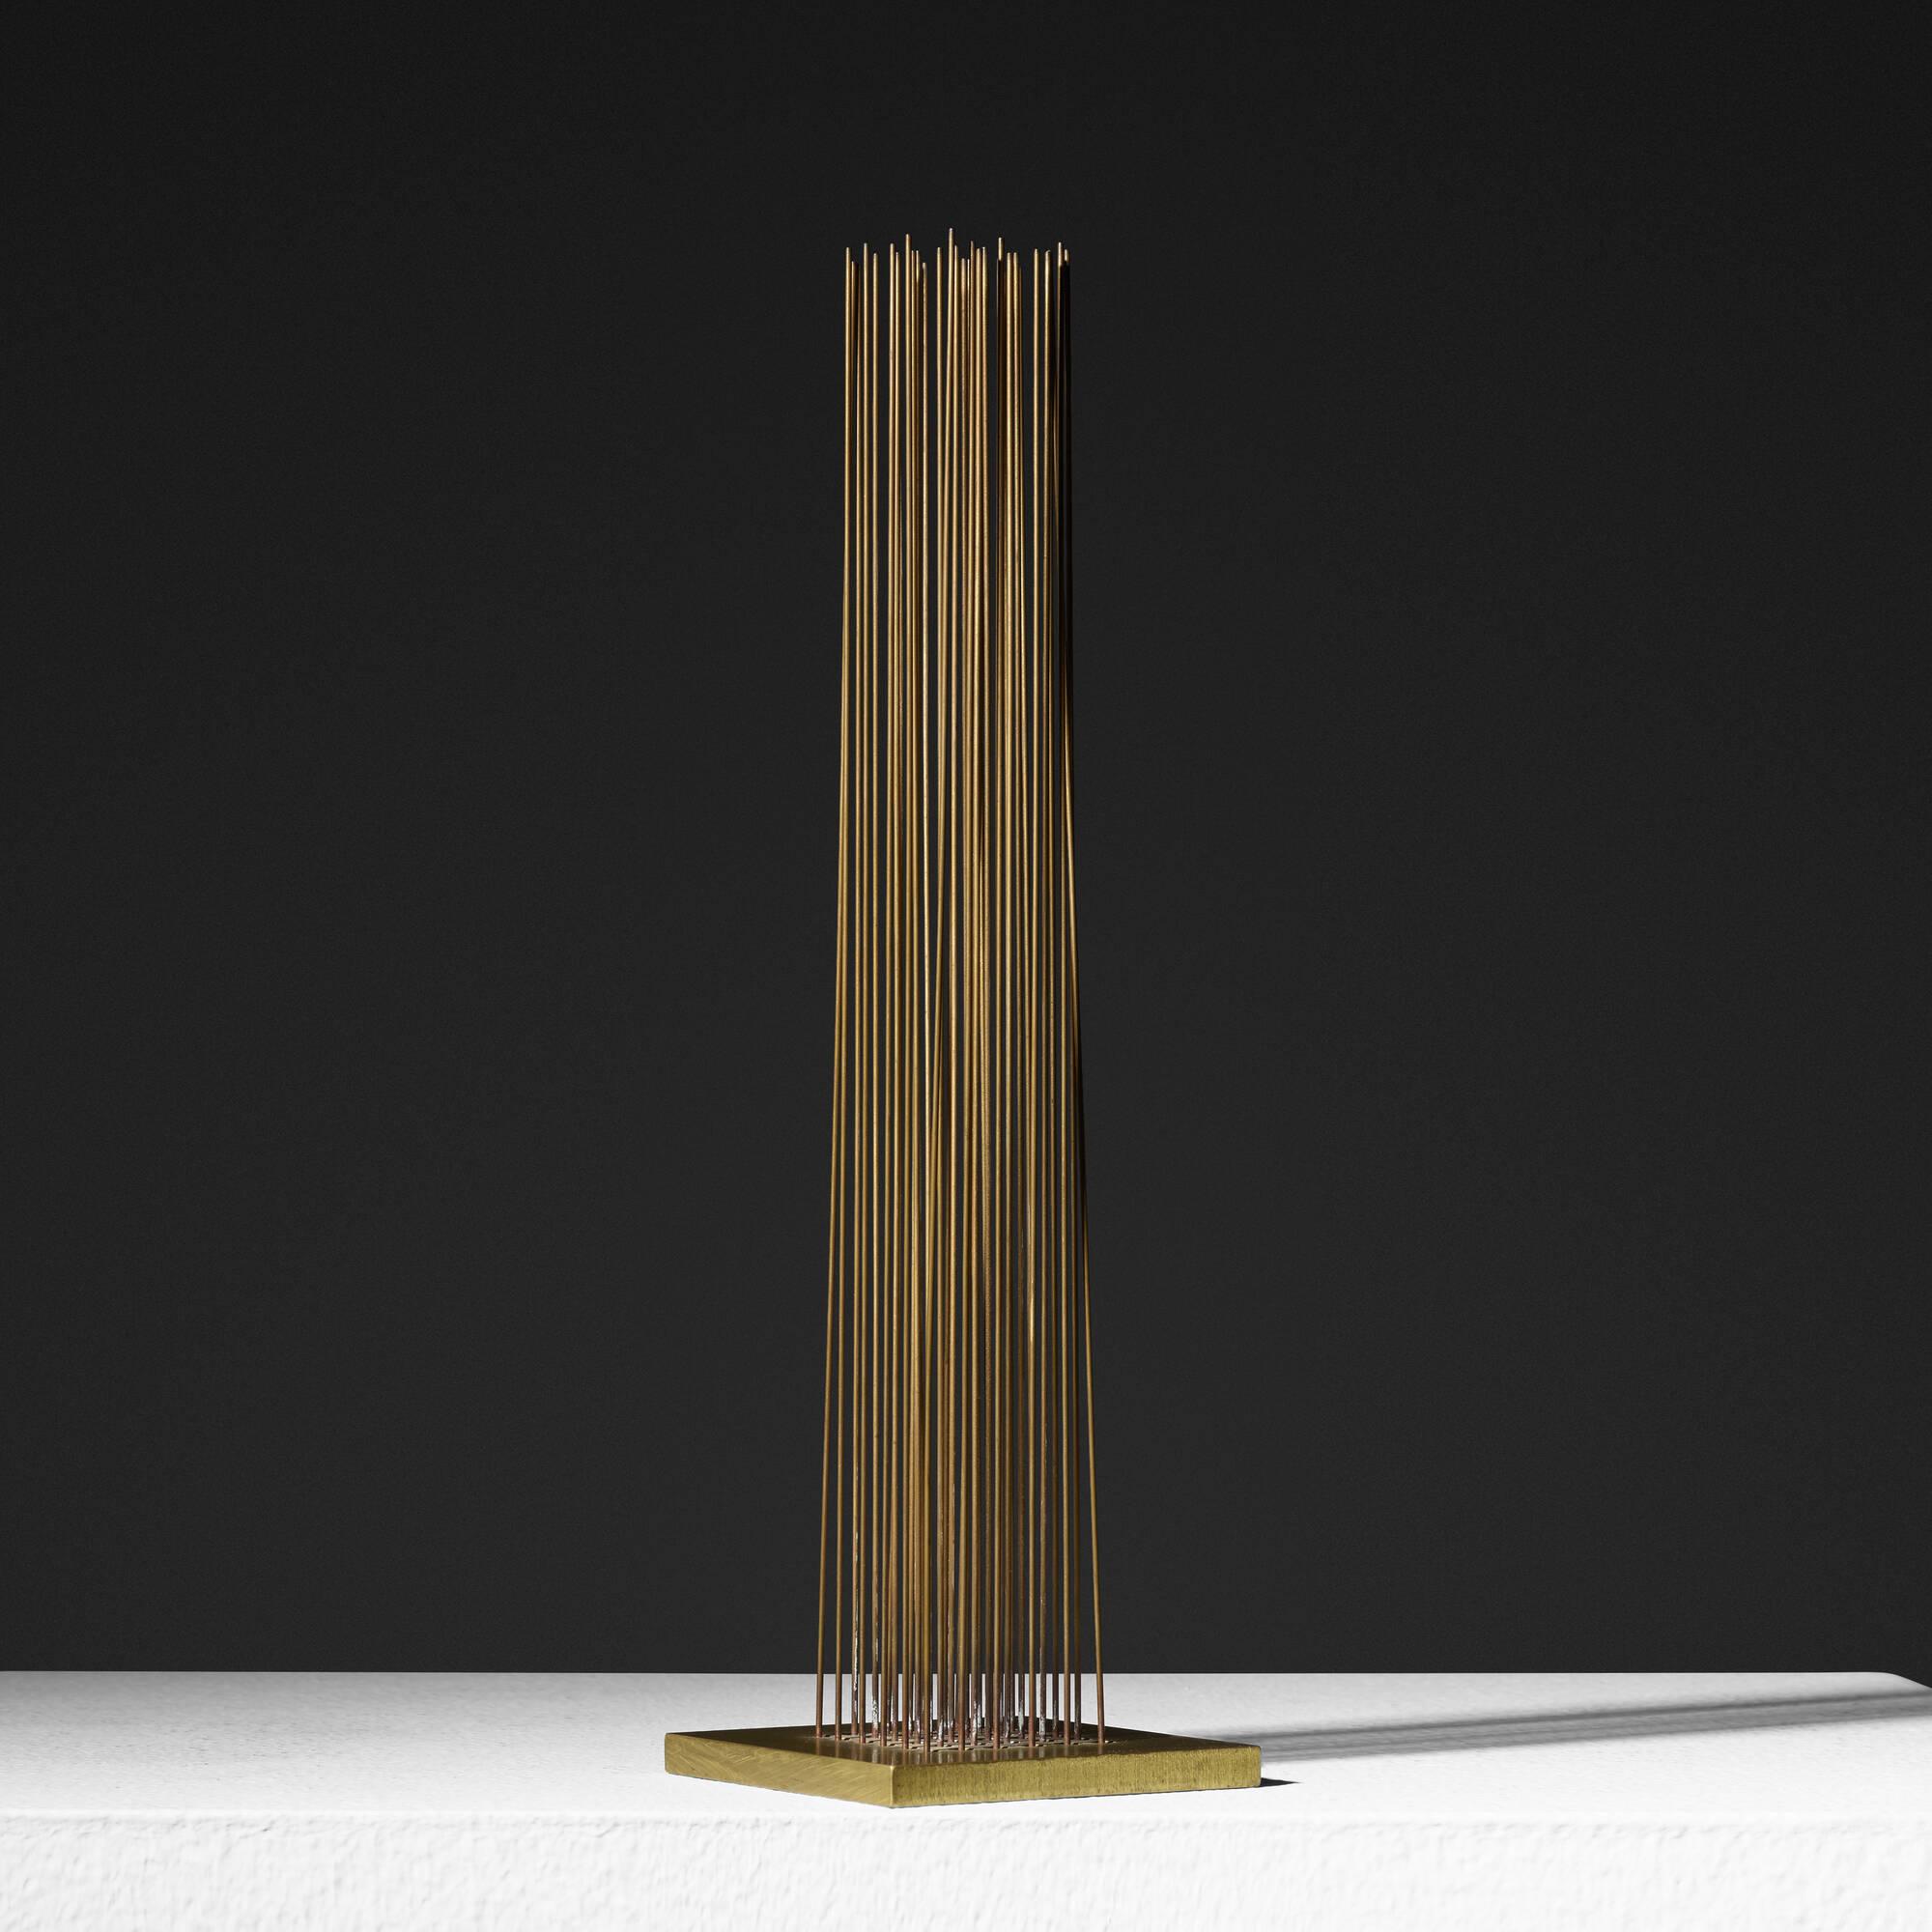 137: Harry Bertoia / Untitled (Sonambient) (1 of 3)